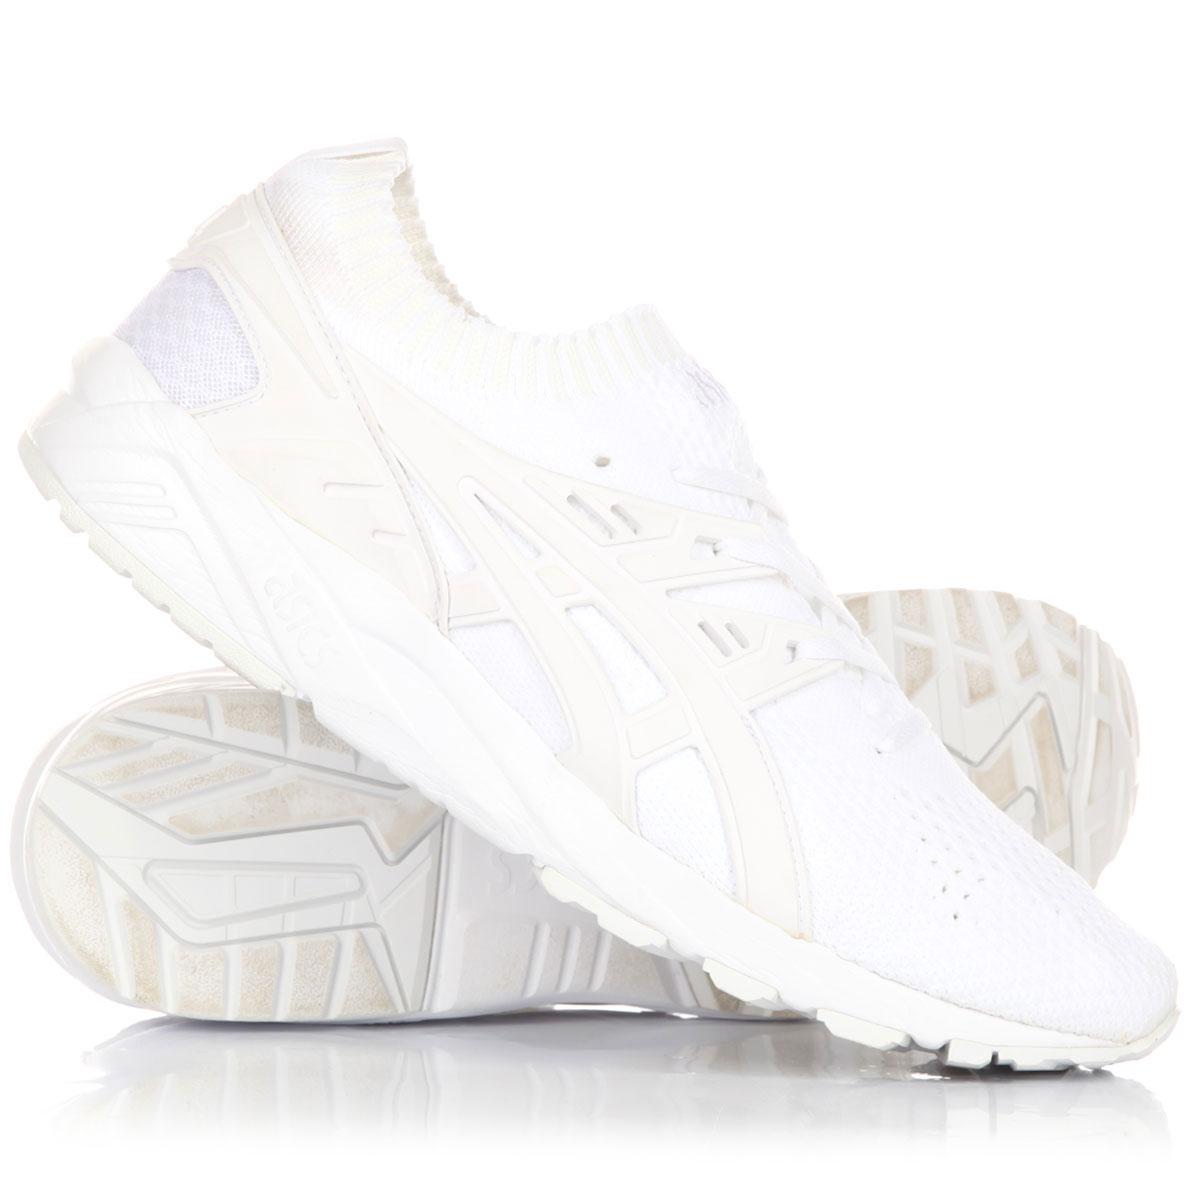 f4e8903d Купить кроссовки ASICS Tiger Gel-Kayano Trainer Kit White в интернет ...